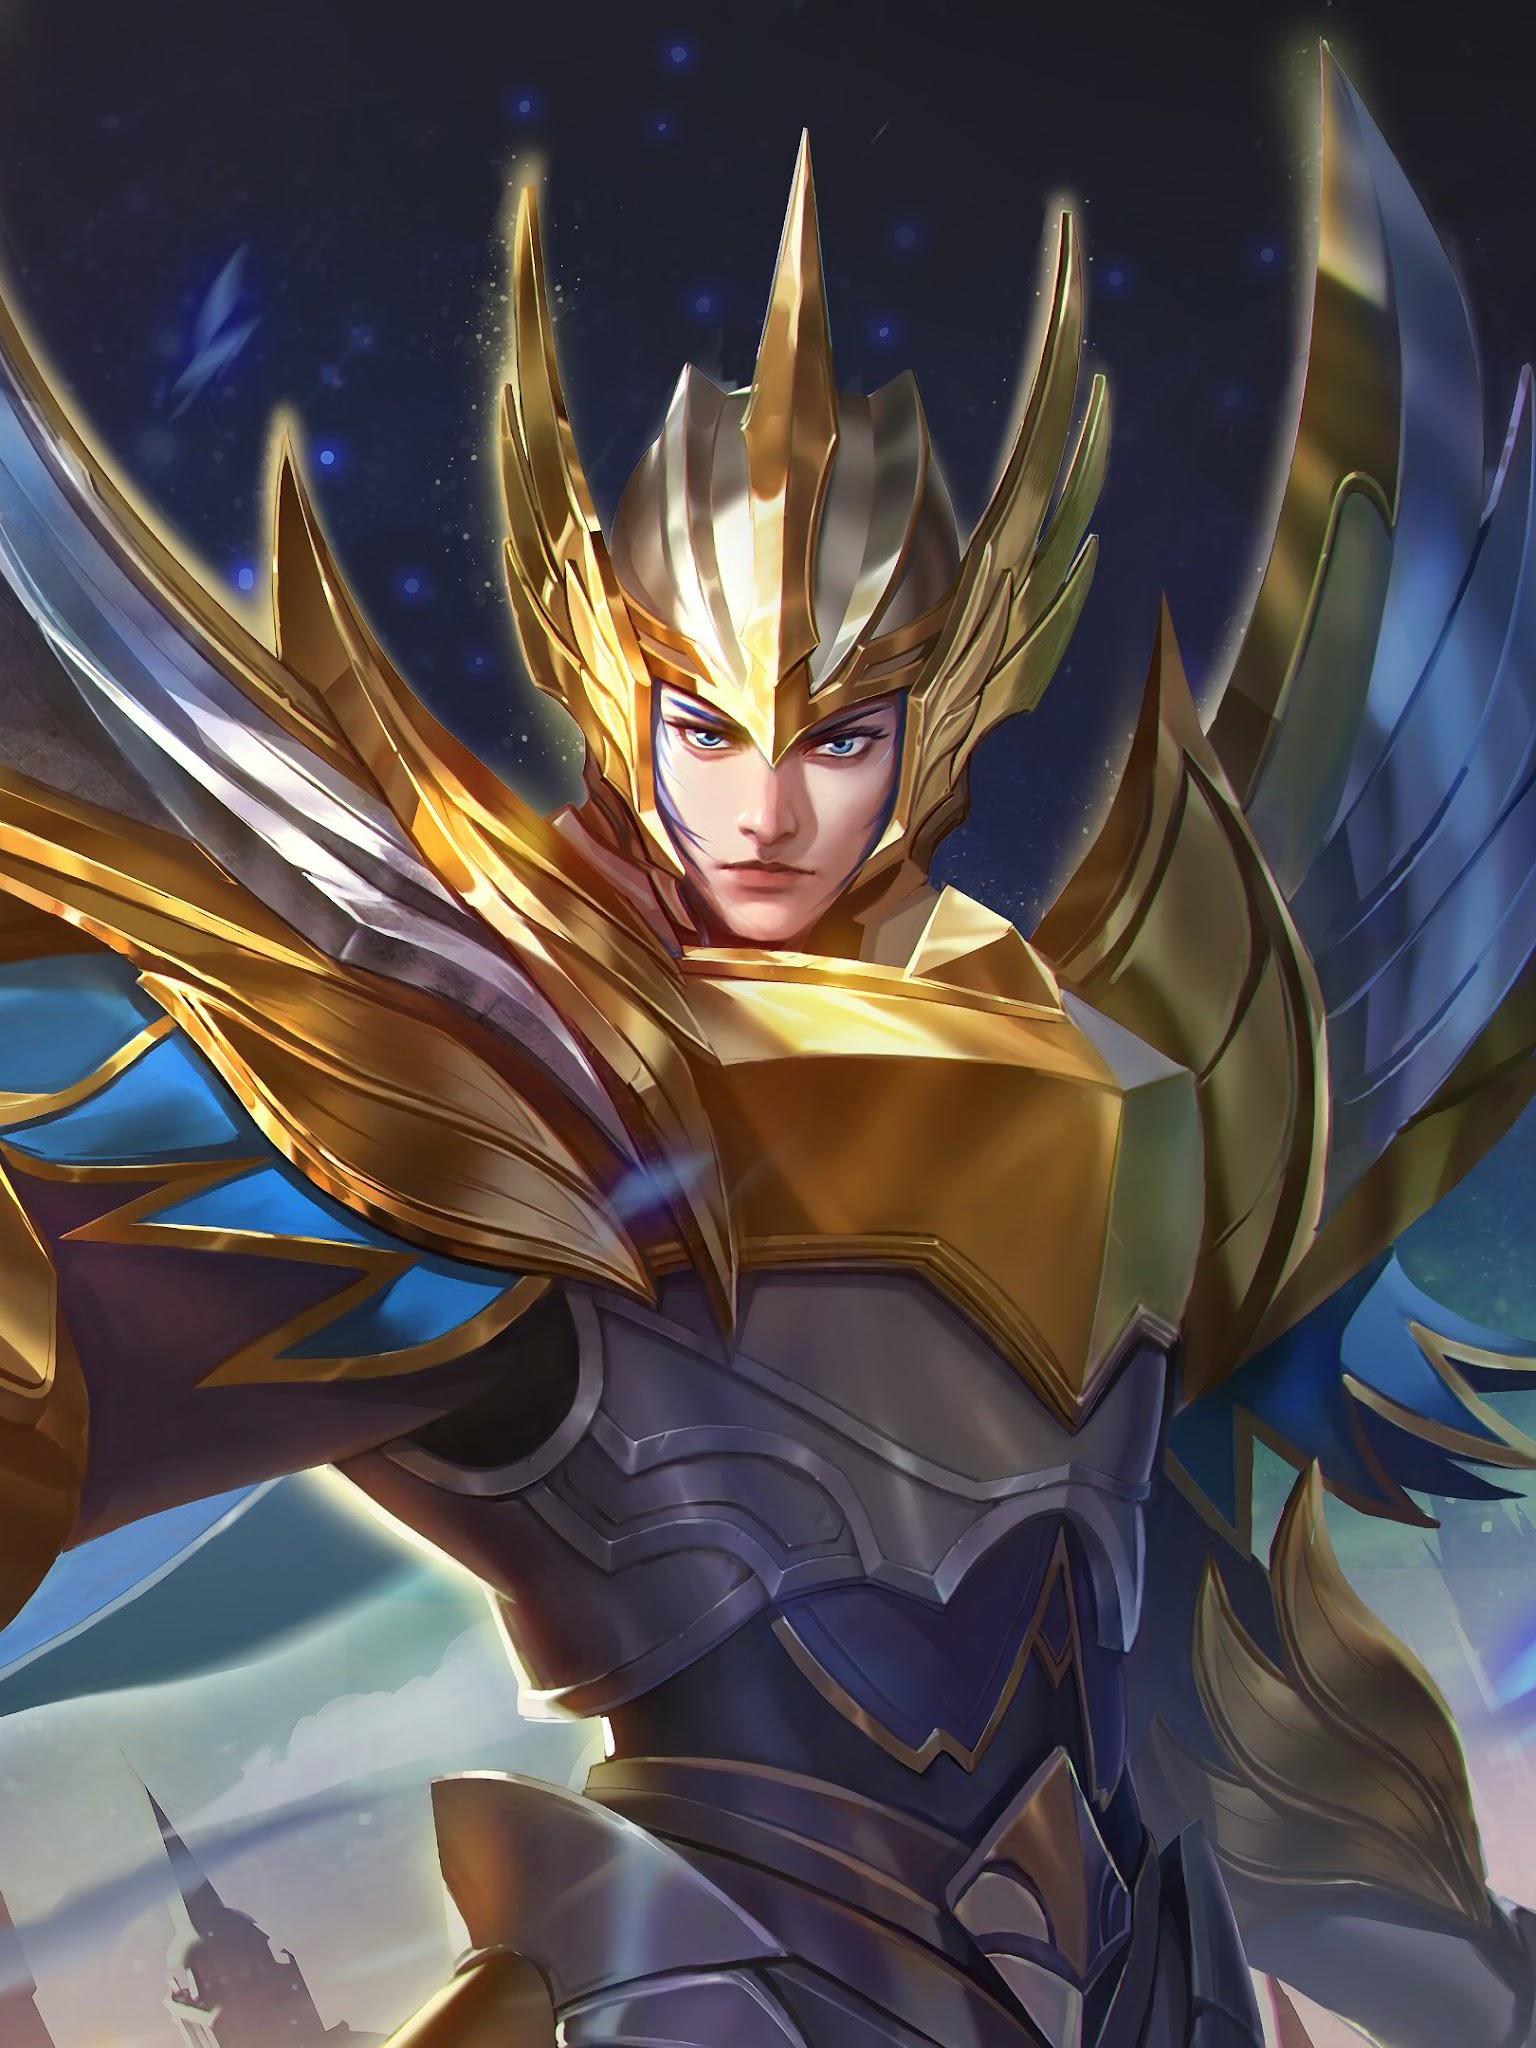 Zilong Glorious General Skin Mobile Legends 4K Wallpaper 33